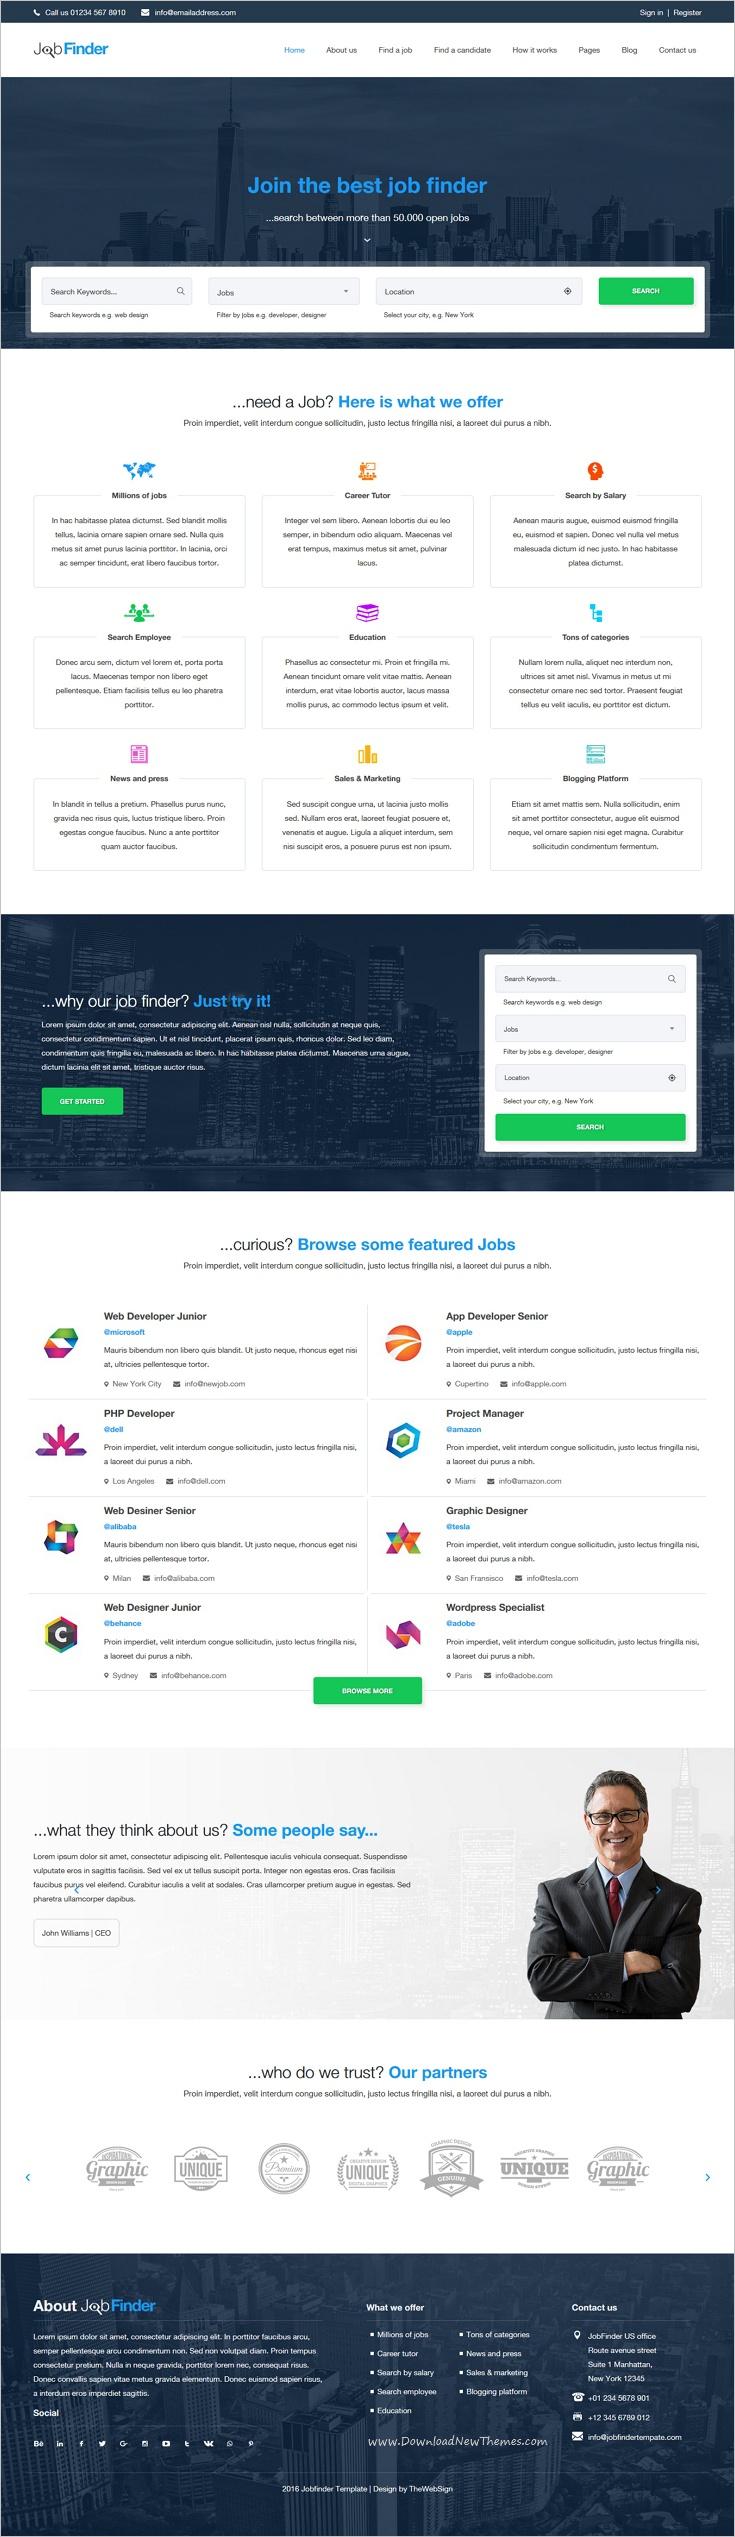 Jobfinder - Job Portal HTML5 Template | Portal